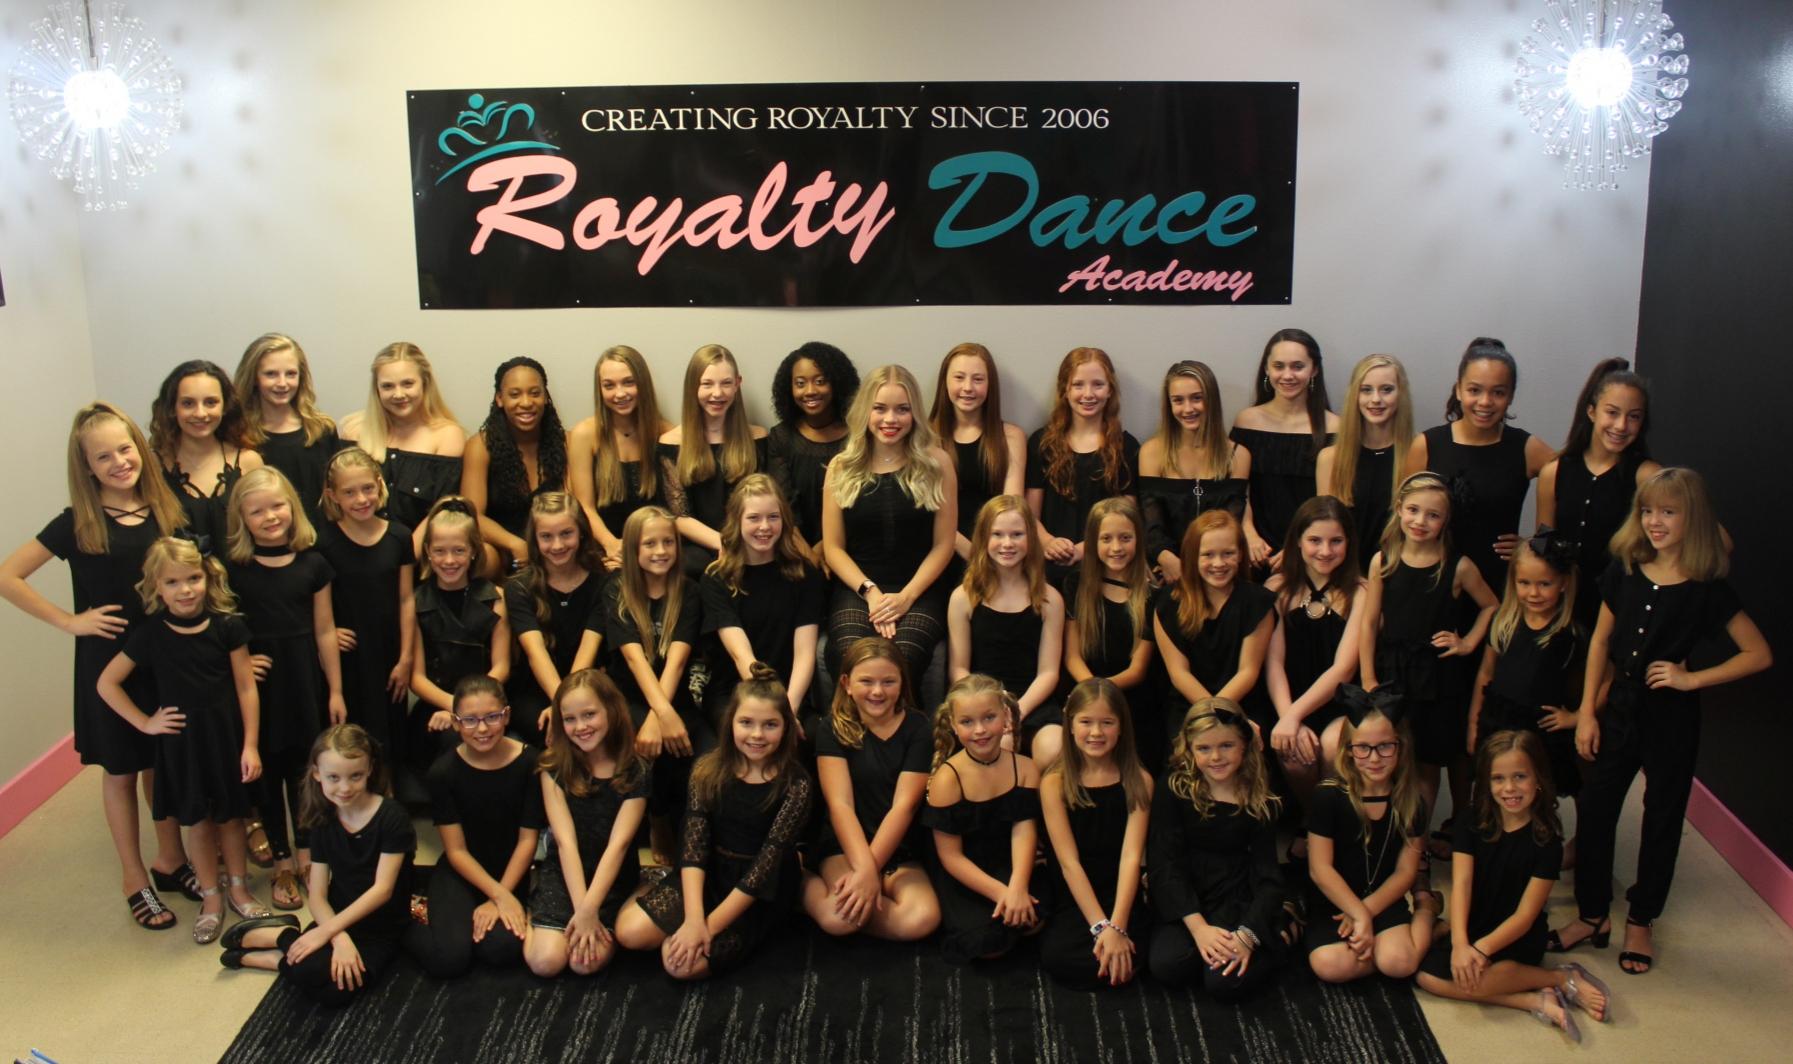 ea17e678b 2018-2019 Royalty Dance Academy Prodigy Dancers - Royalty Dance Academy